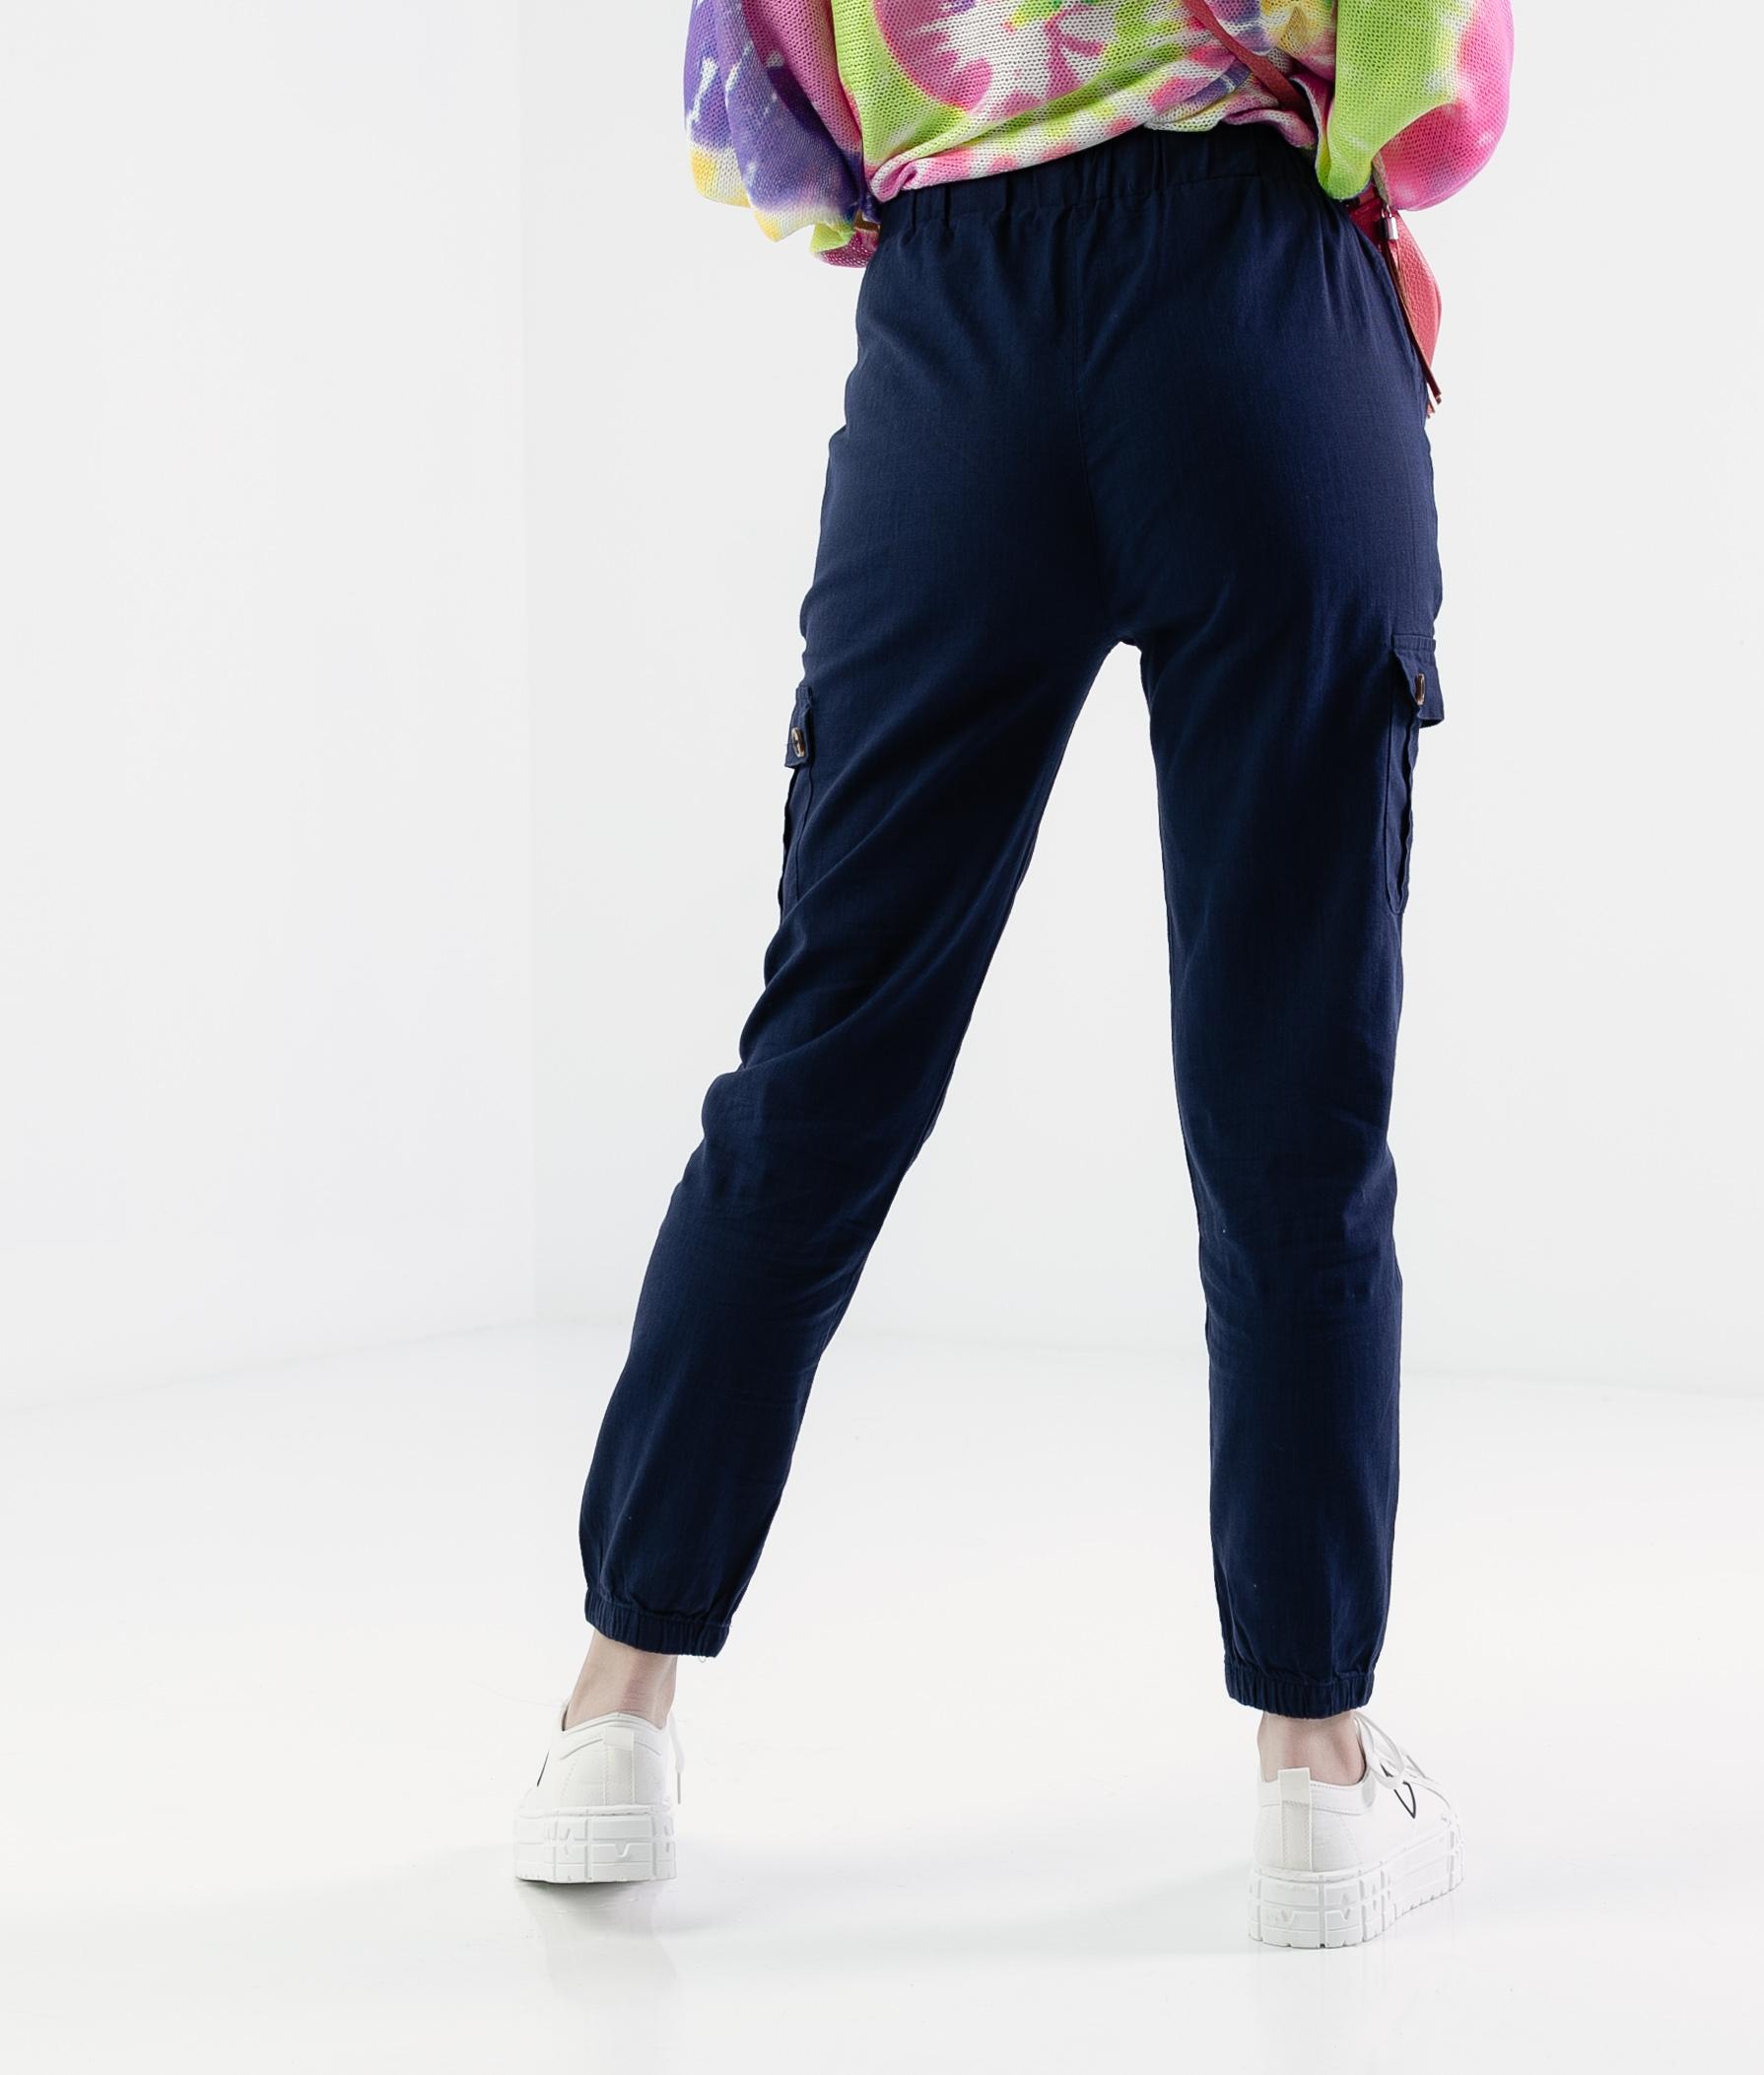 Pantalón Polne - Azul Marinho